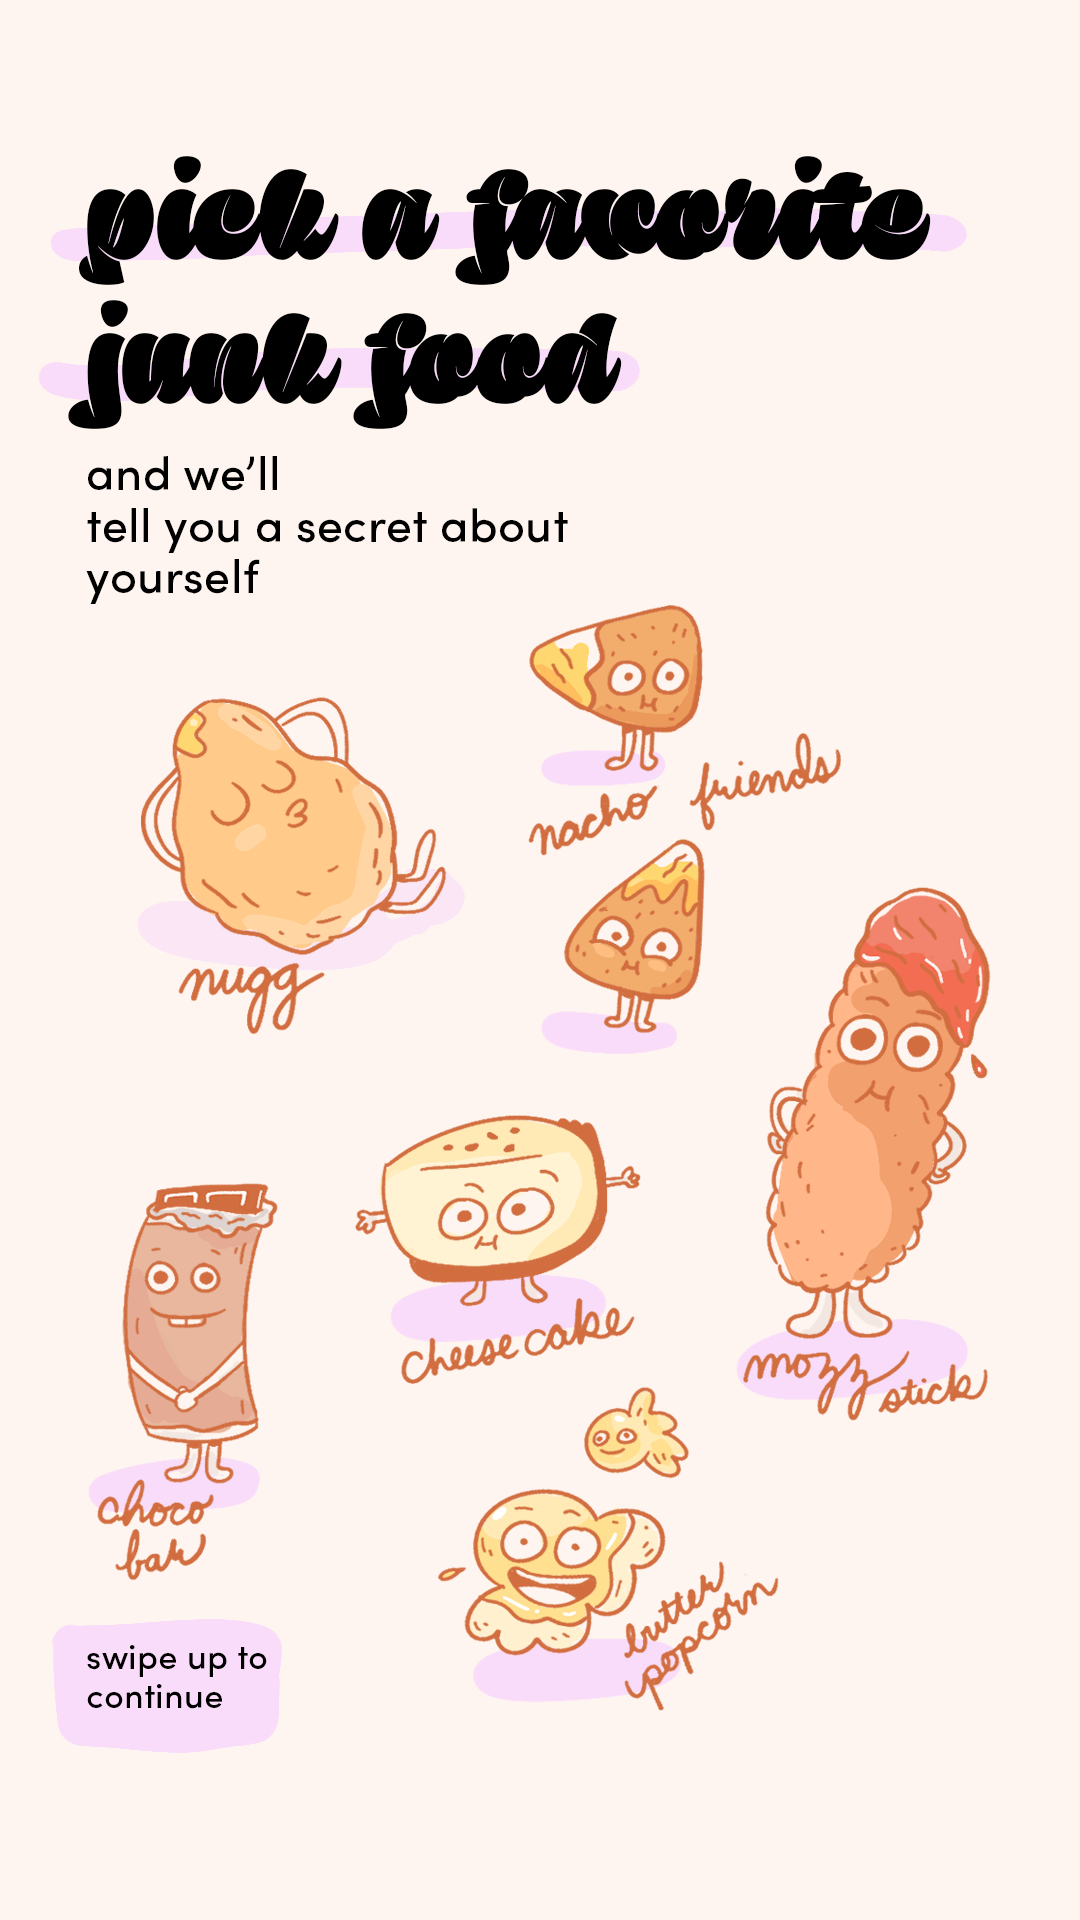 STSF06612 junk food secrets.png